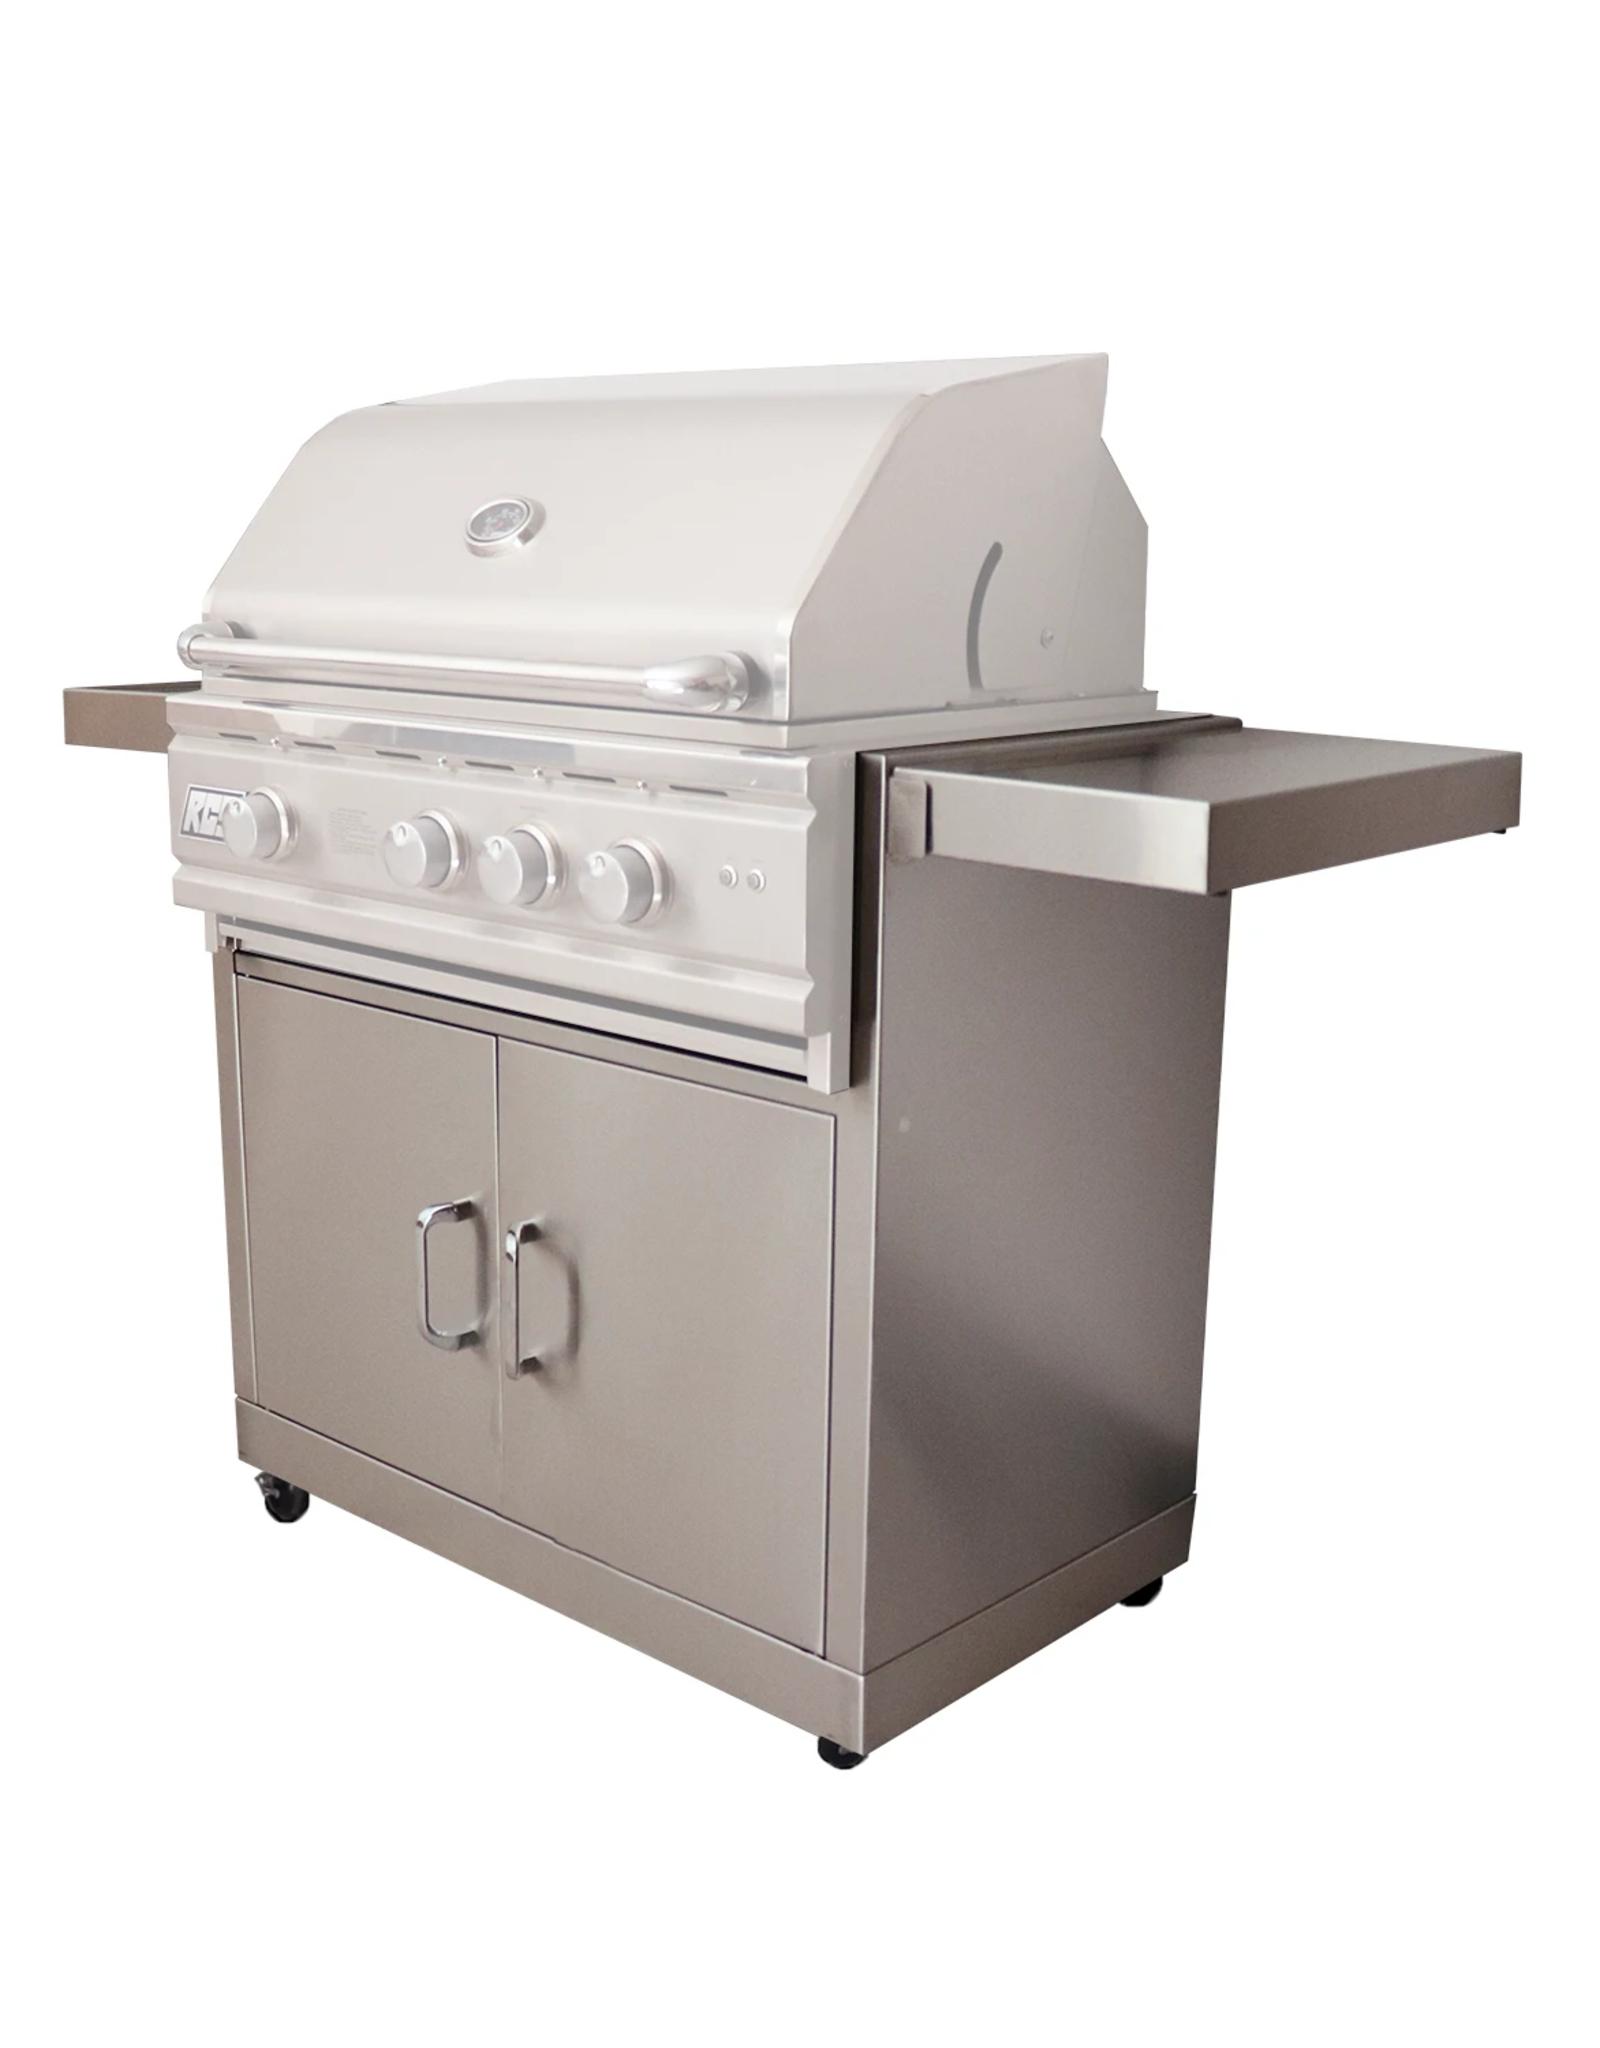 "Renaissance Cooking Systems Renaissance Cooking Systems Portable Cart for 30"" Cutlass Pro Grills - RONMC"